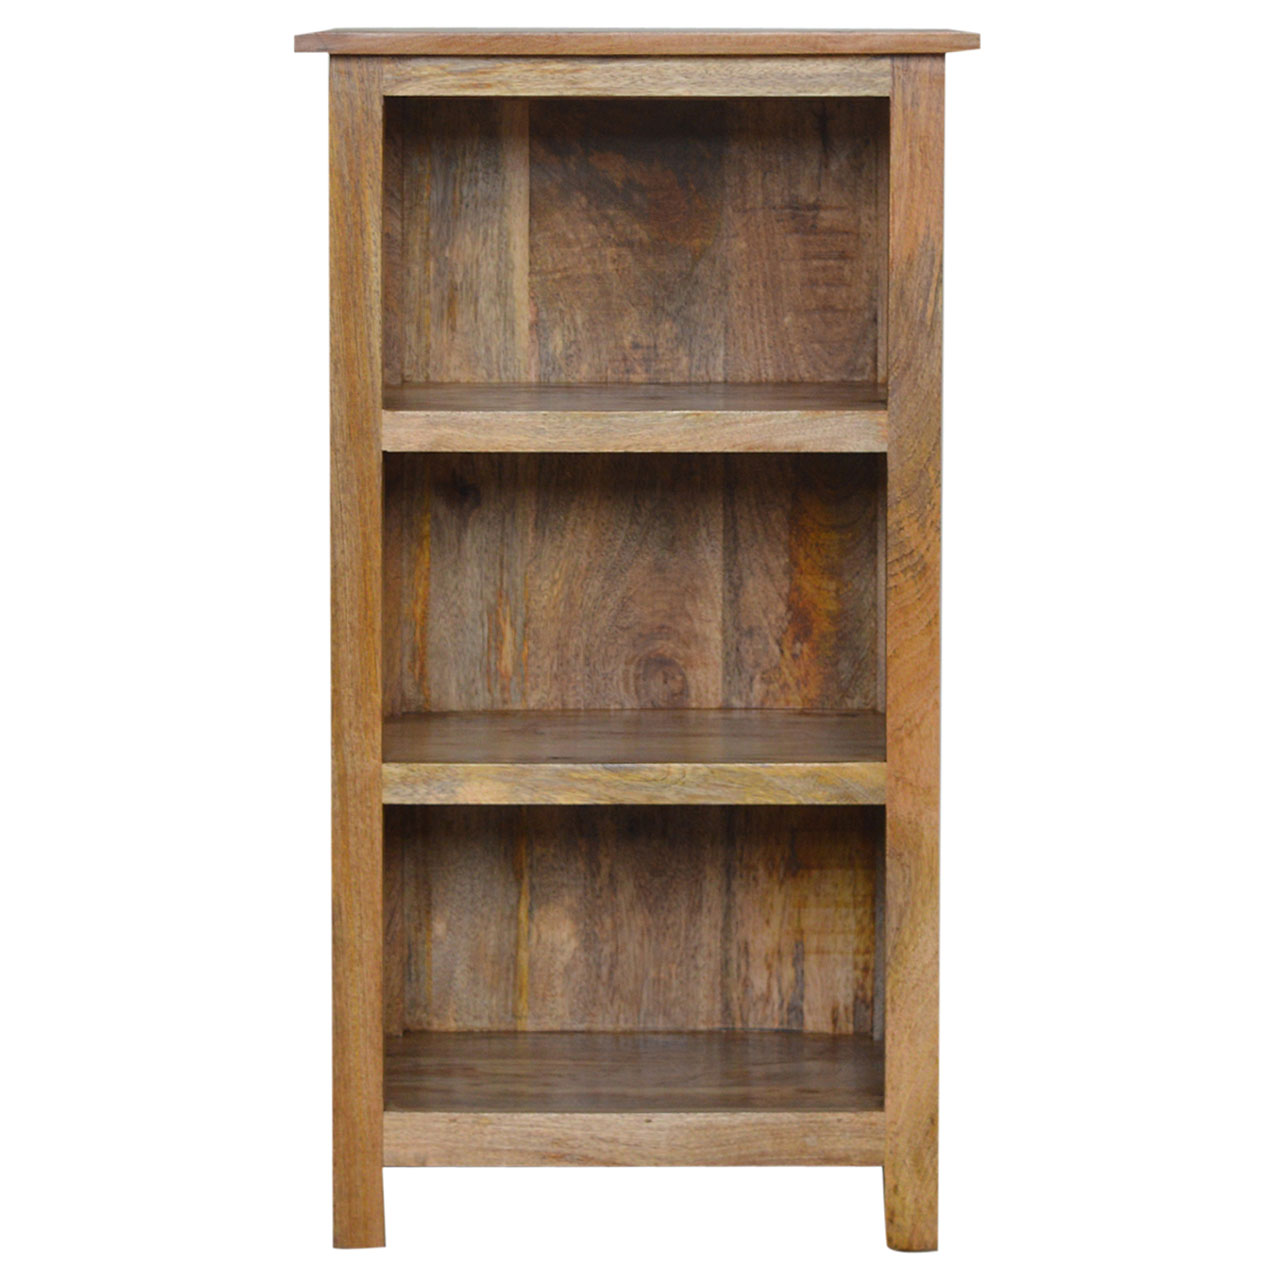 IN002102cm Rustic Bookcase 3 Shelves